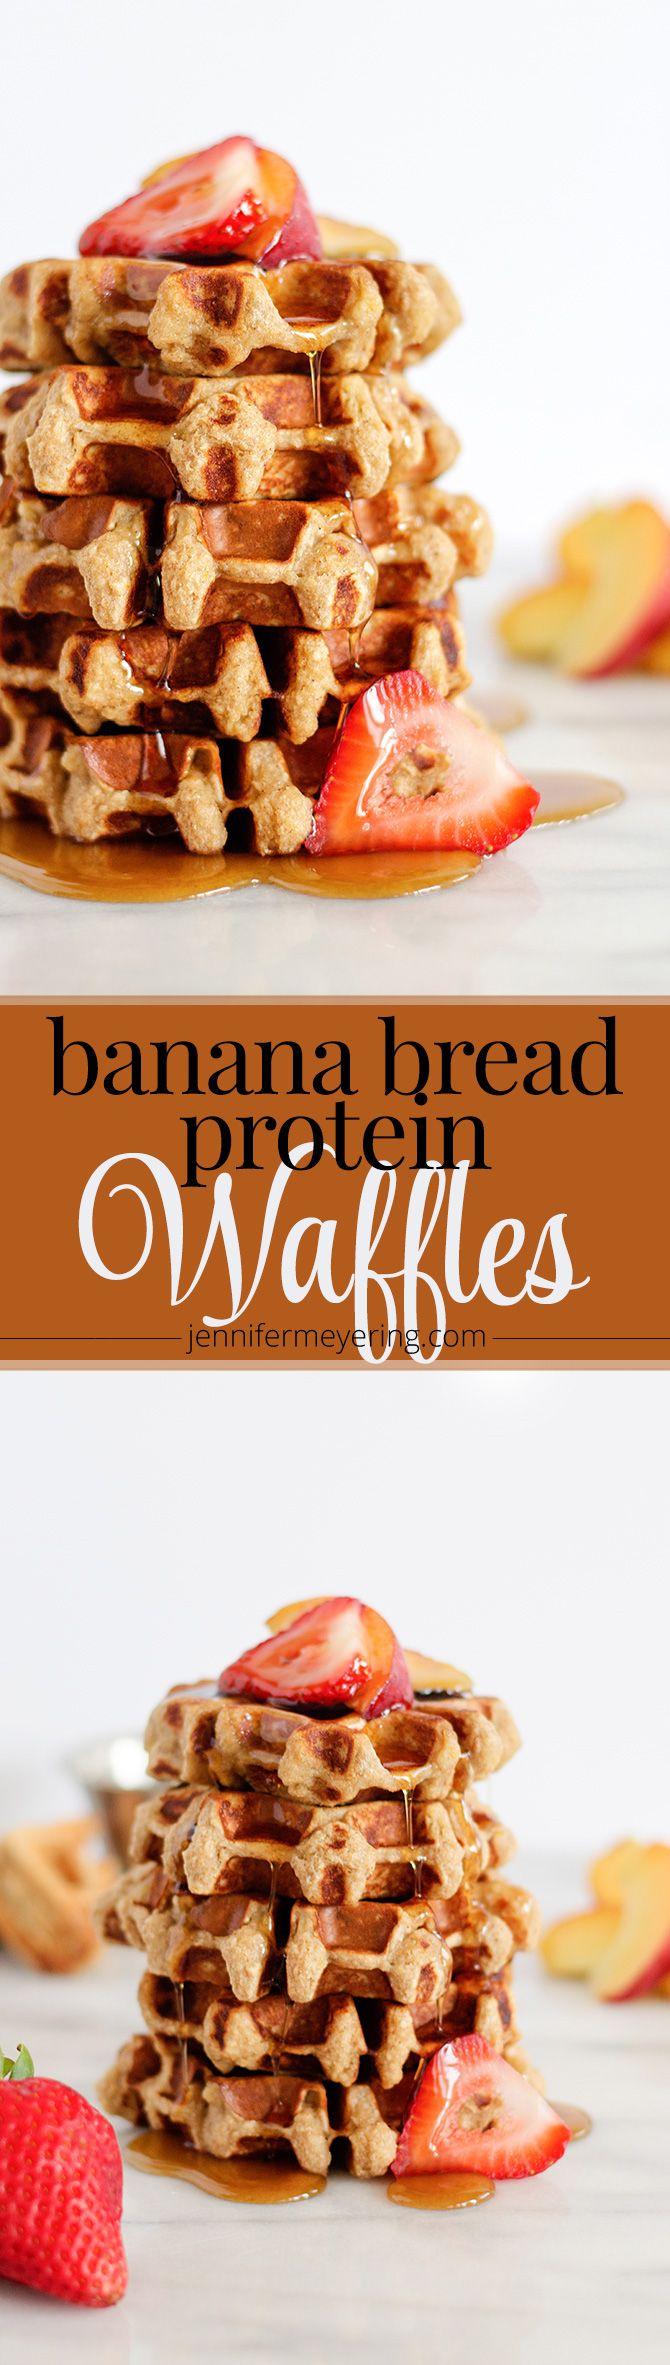 Banana Bread Protein Waffles | JenniferMeyering.com